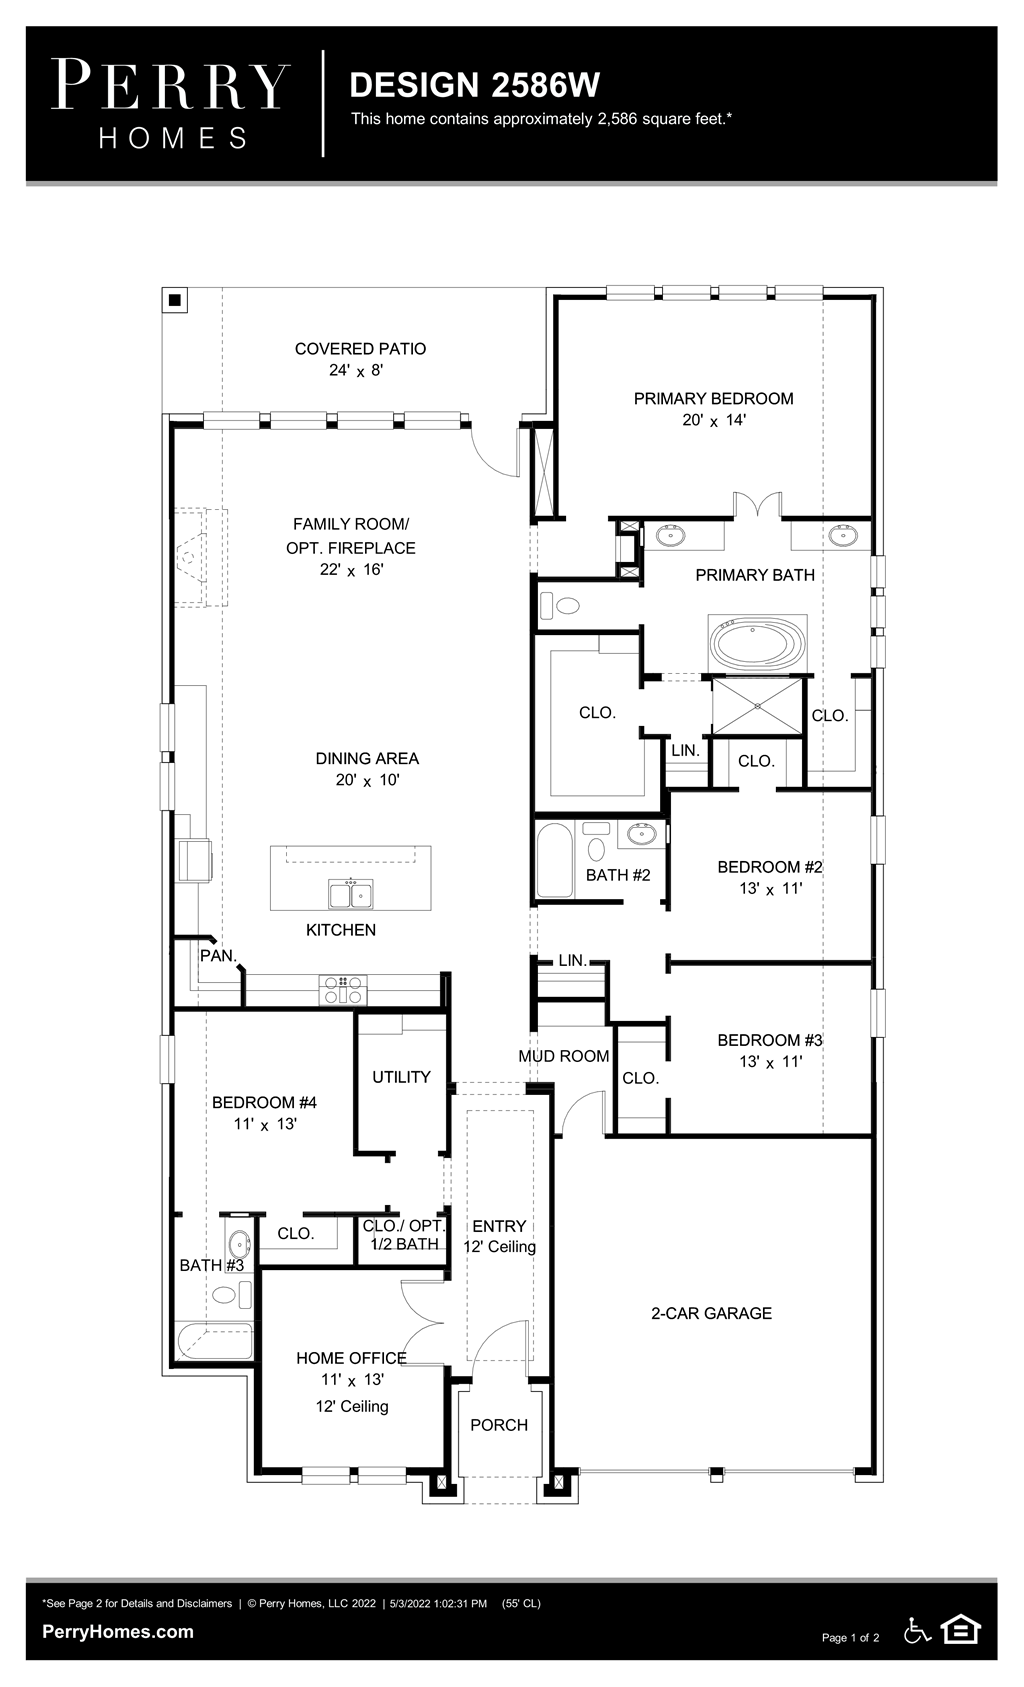 Floor Plan for 2586W